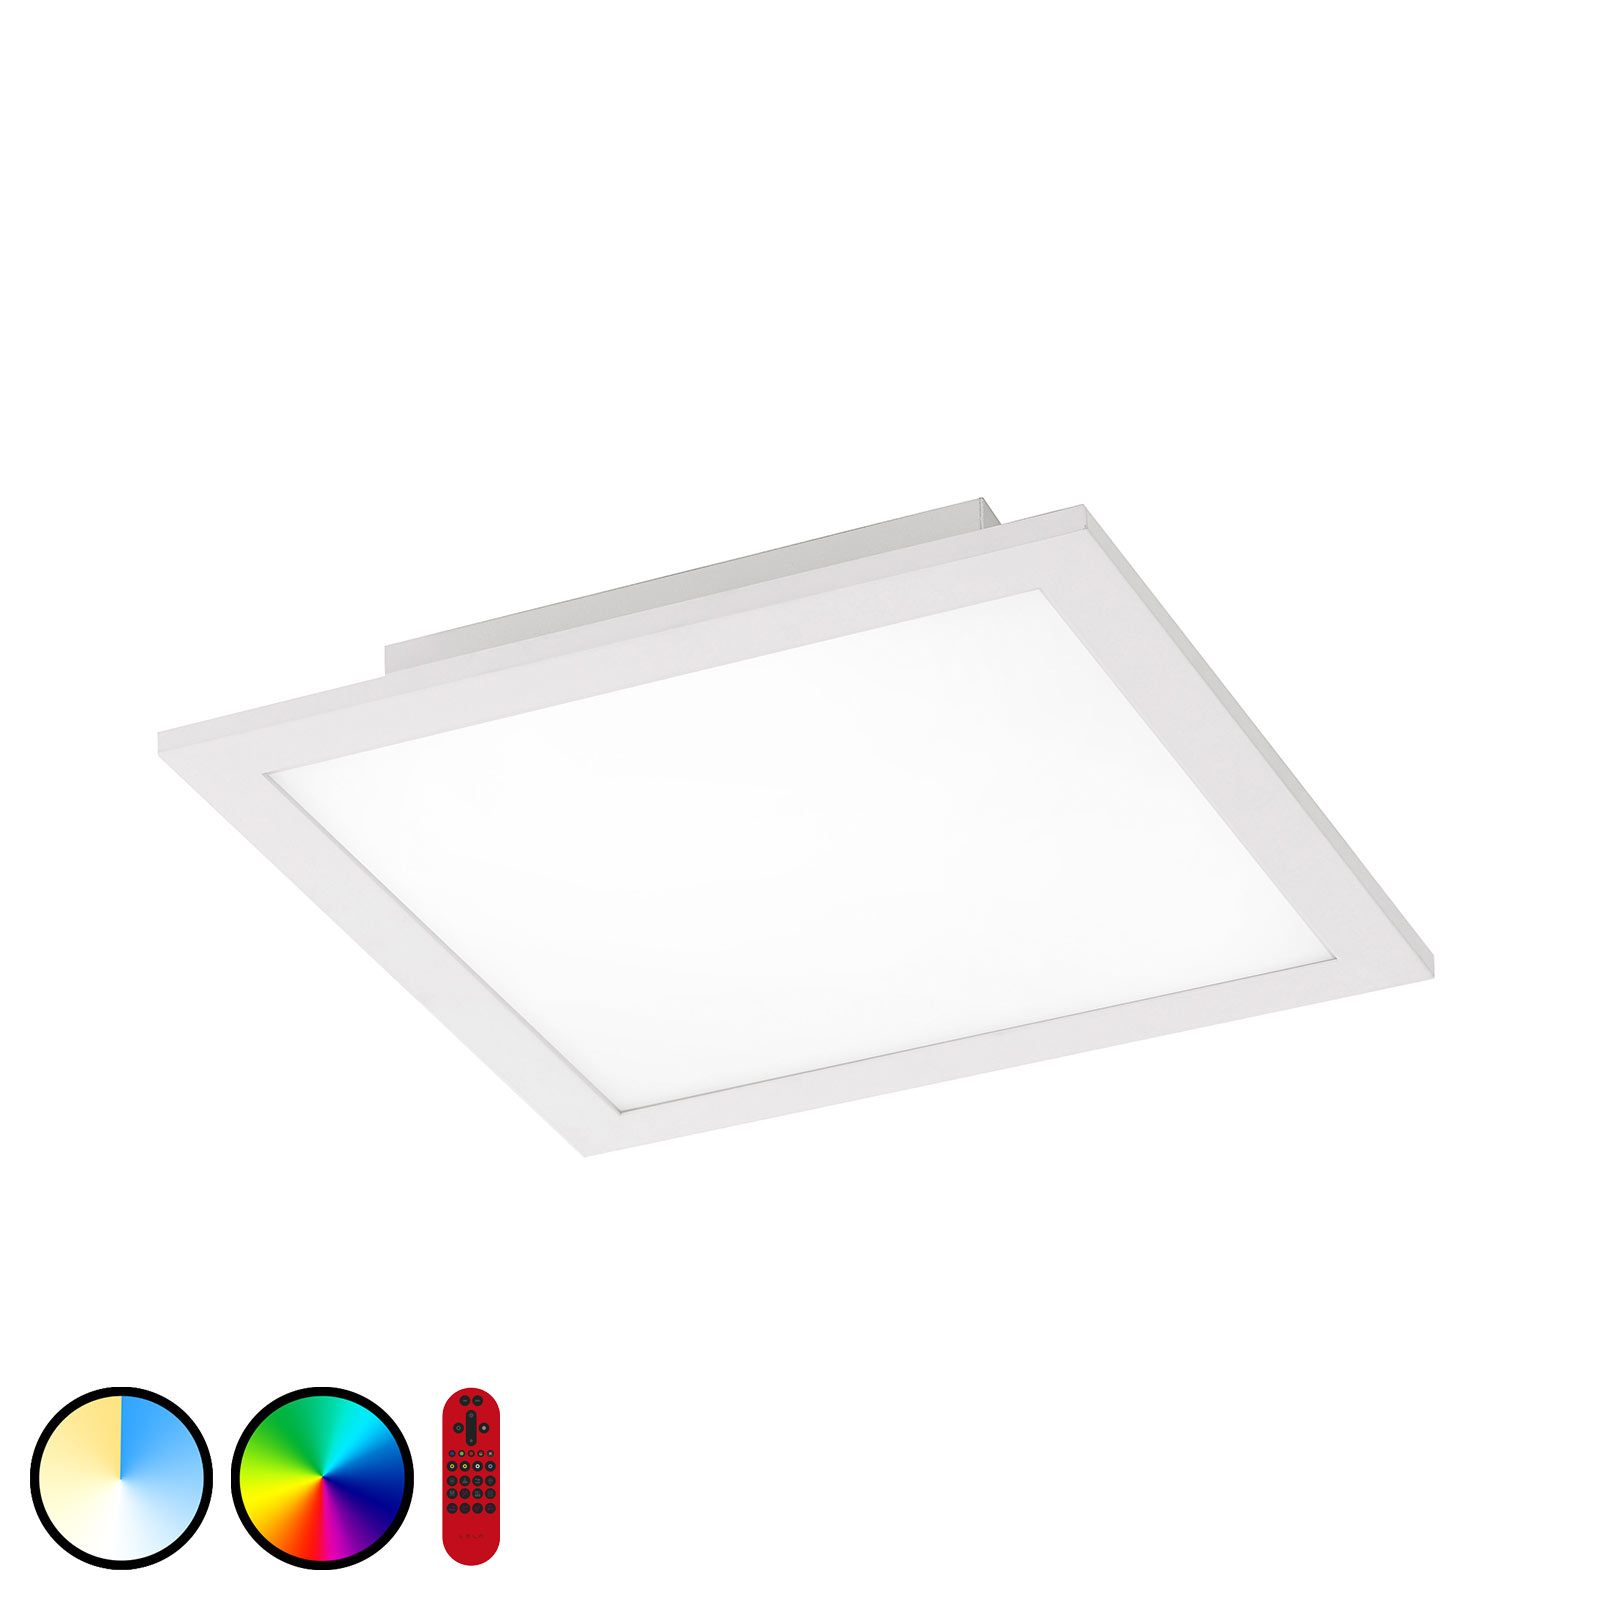 Plafonnier LED LOLAsmart Flat, 30 x 30cm